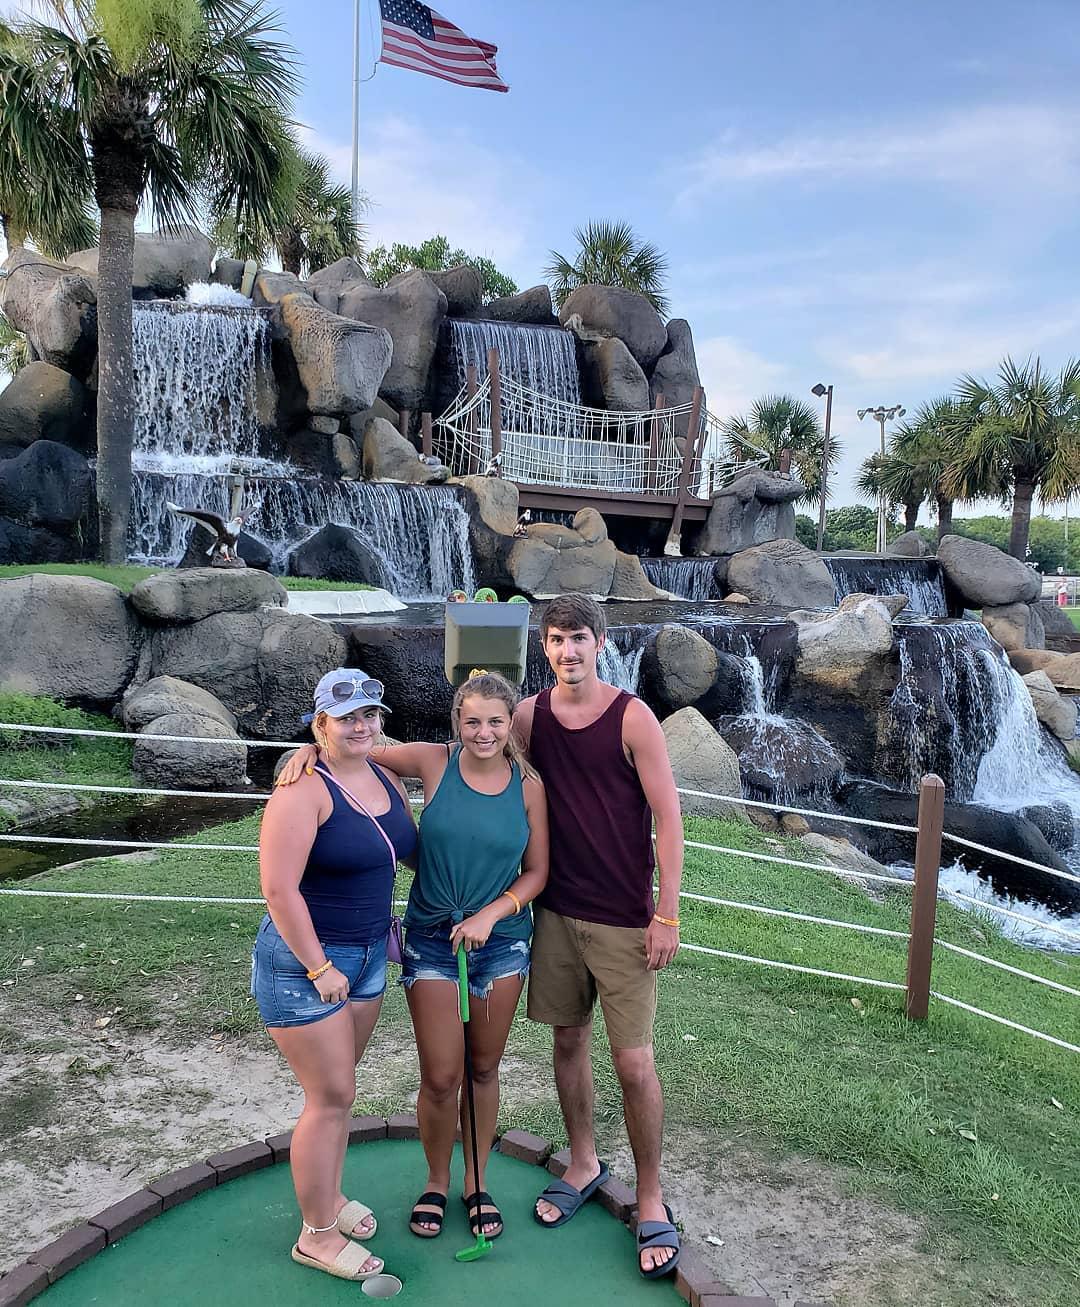 Panama City Beach Things To Do - Hidden Lagoon Super Race Track and Golf - Original Photo